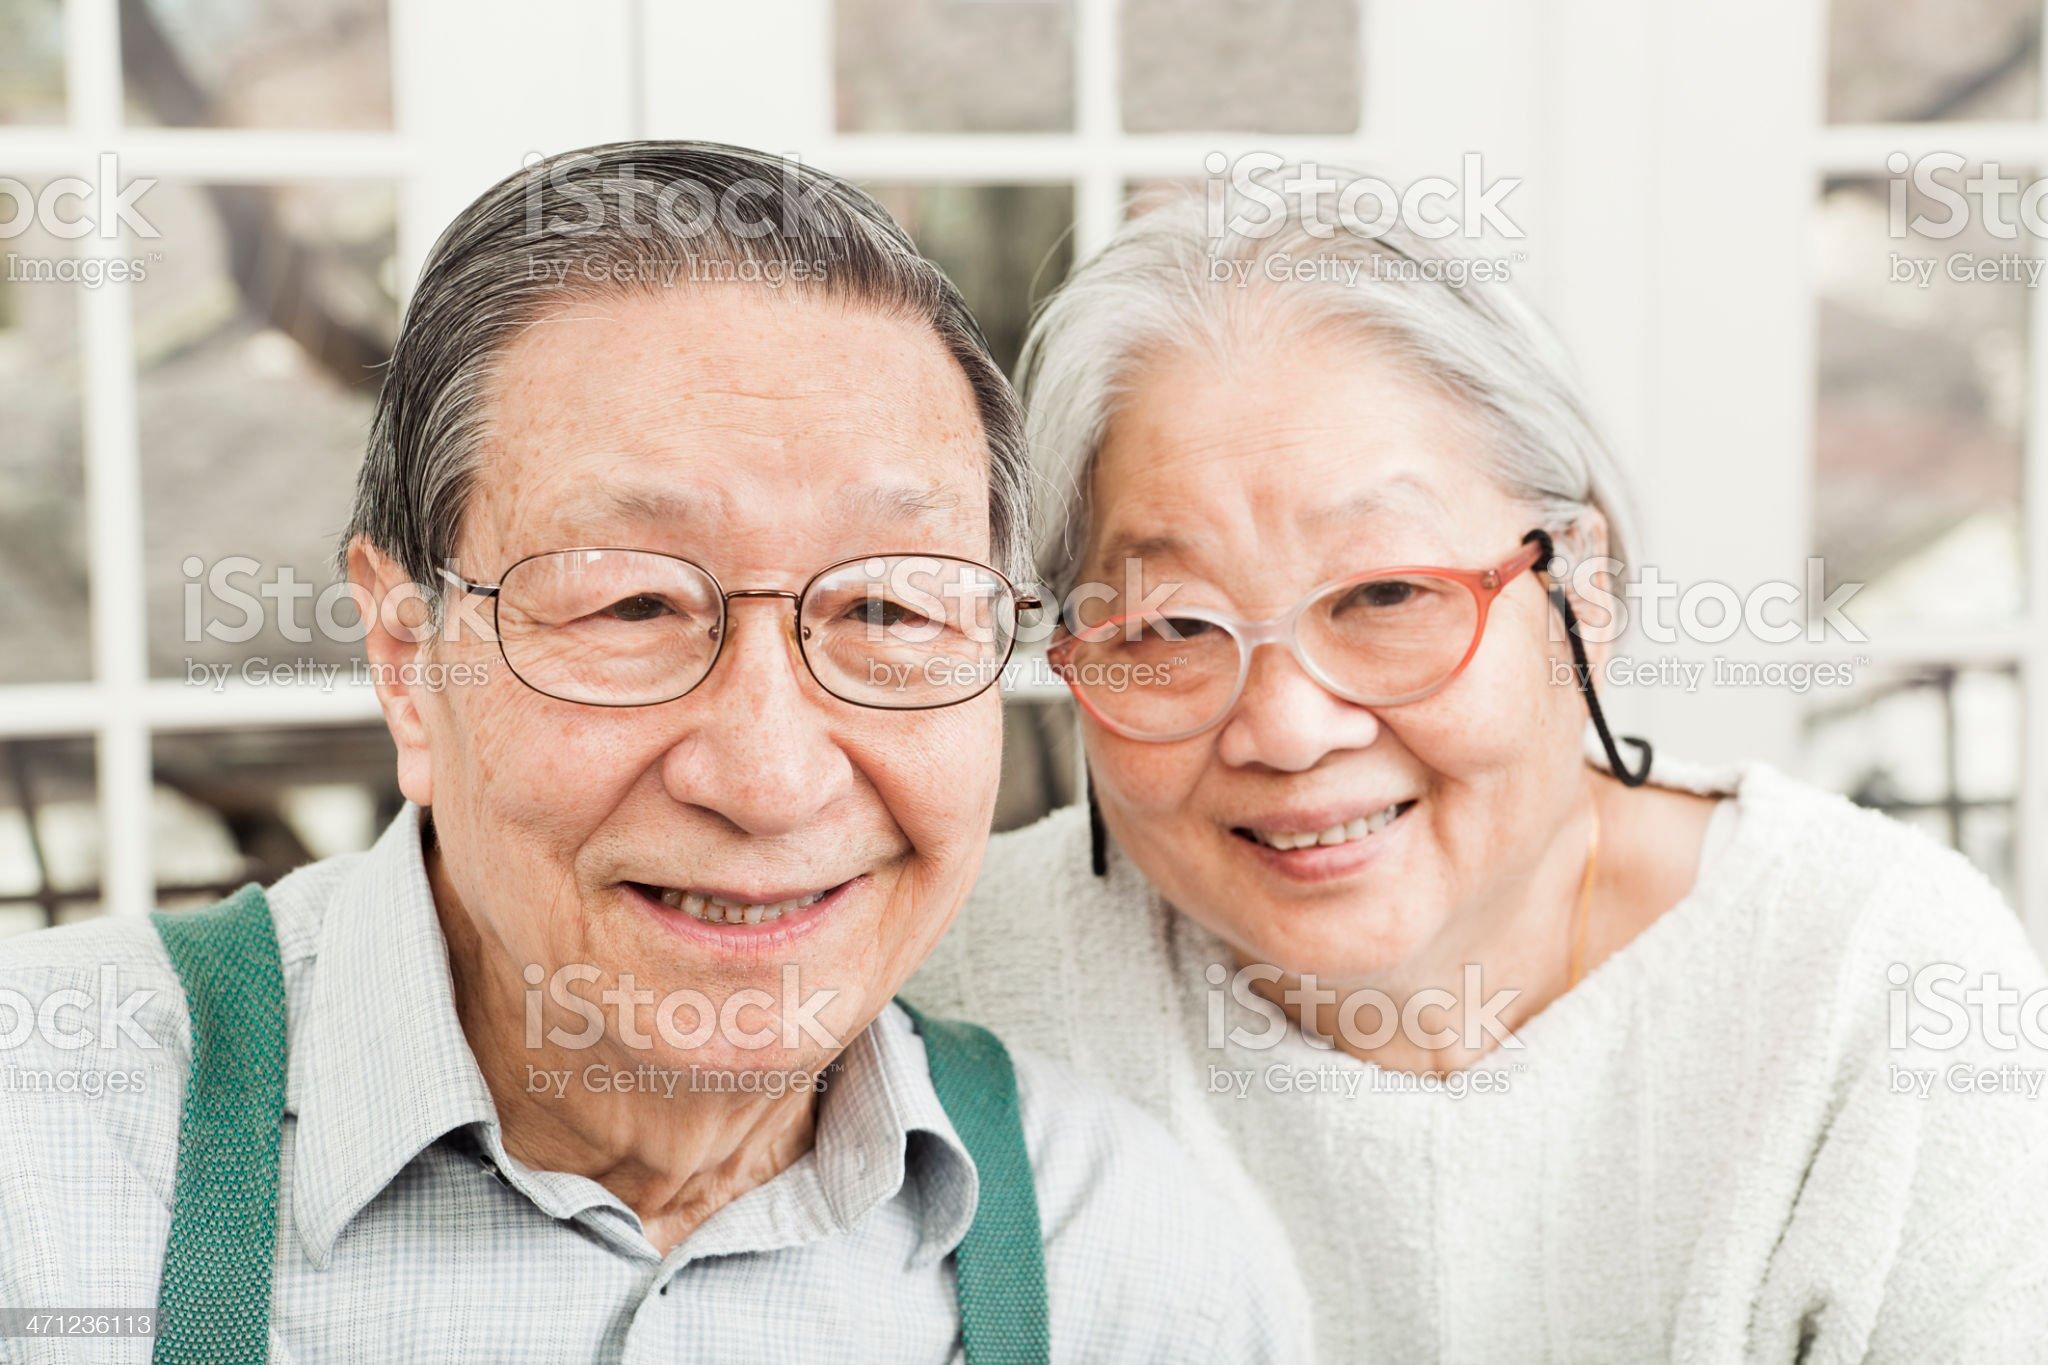 Portrait of Happy Asian Senior Couple by Windows royalty-free stock photo